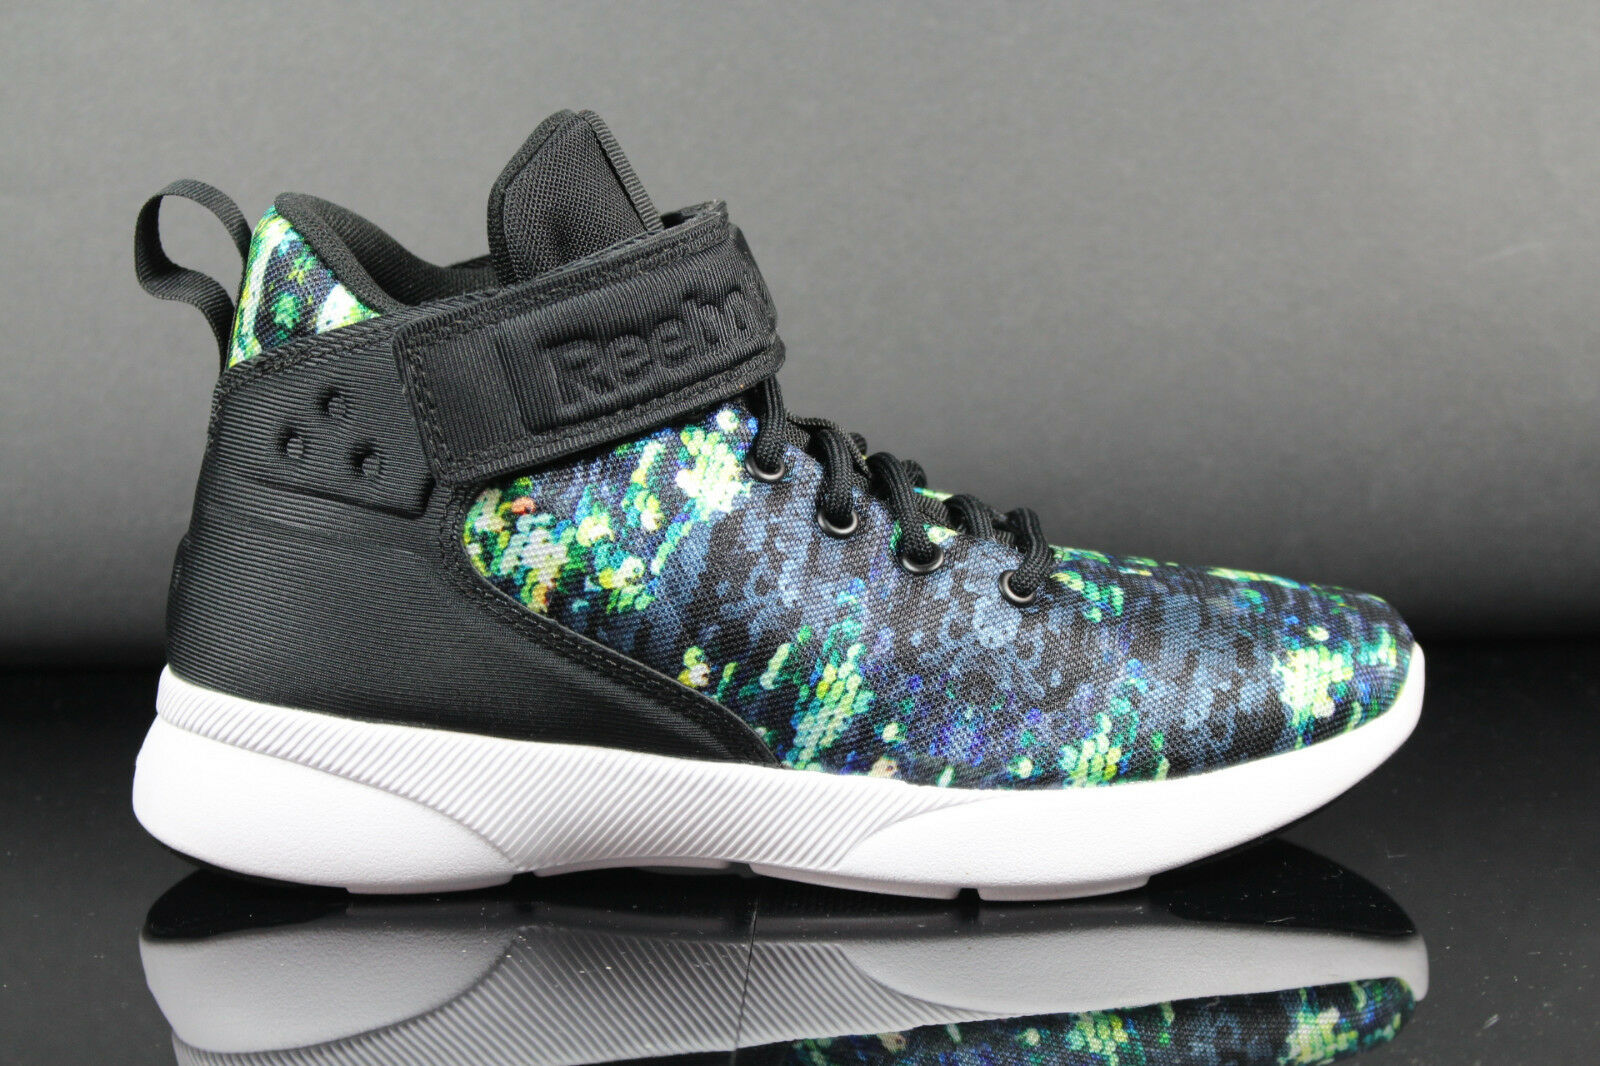 Neu REEBOK Yasuri Damen Tanzschuhe Schuhe Sneaker Sportschuhe V68751